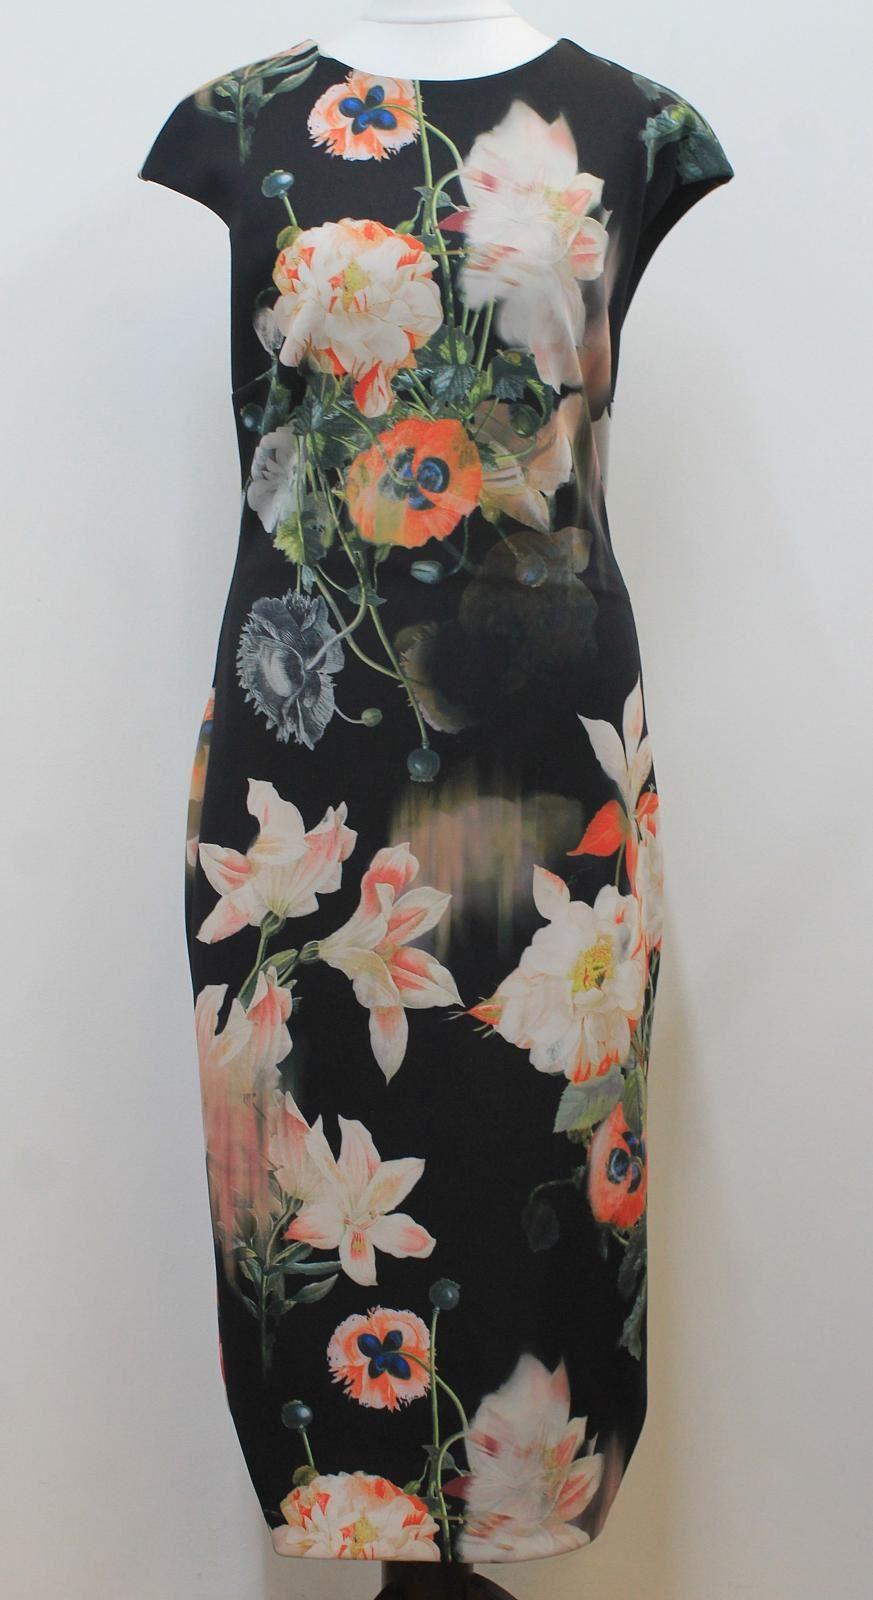 TED-BAKER-Ladies-Multi-Coloured-Floral-Print-Cap-Sleeve-Dress-Size-3-UK12